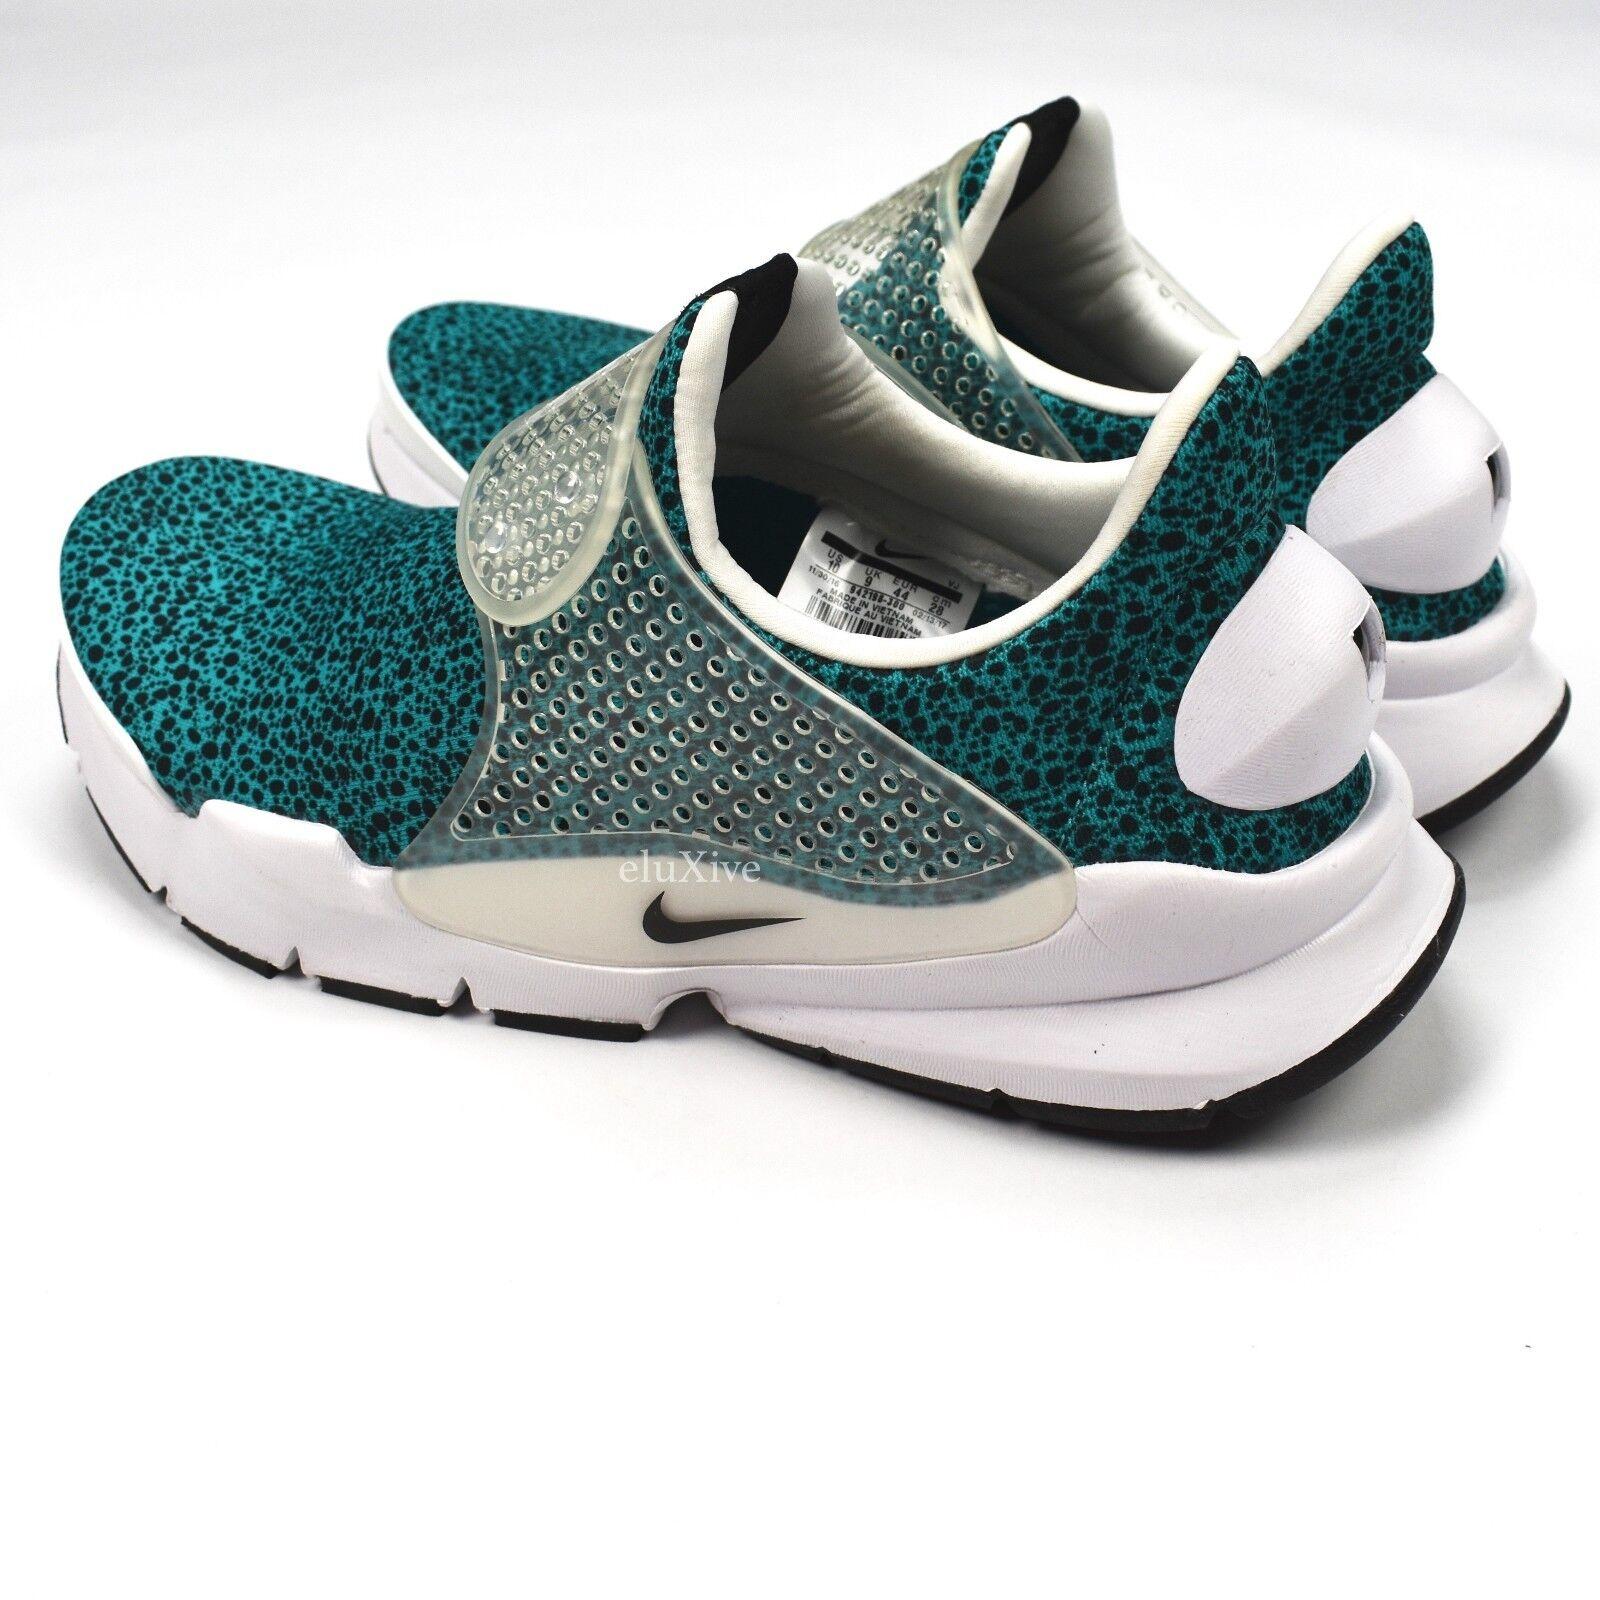 NEW Nike Men's Sock Dart QS Safari Turbo Green Green Green Teal Sneakers 2017 10 AUTHENTIC fc575b